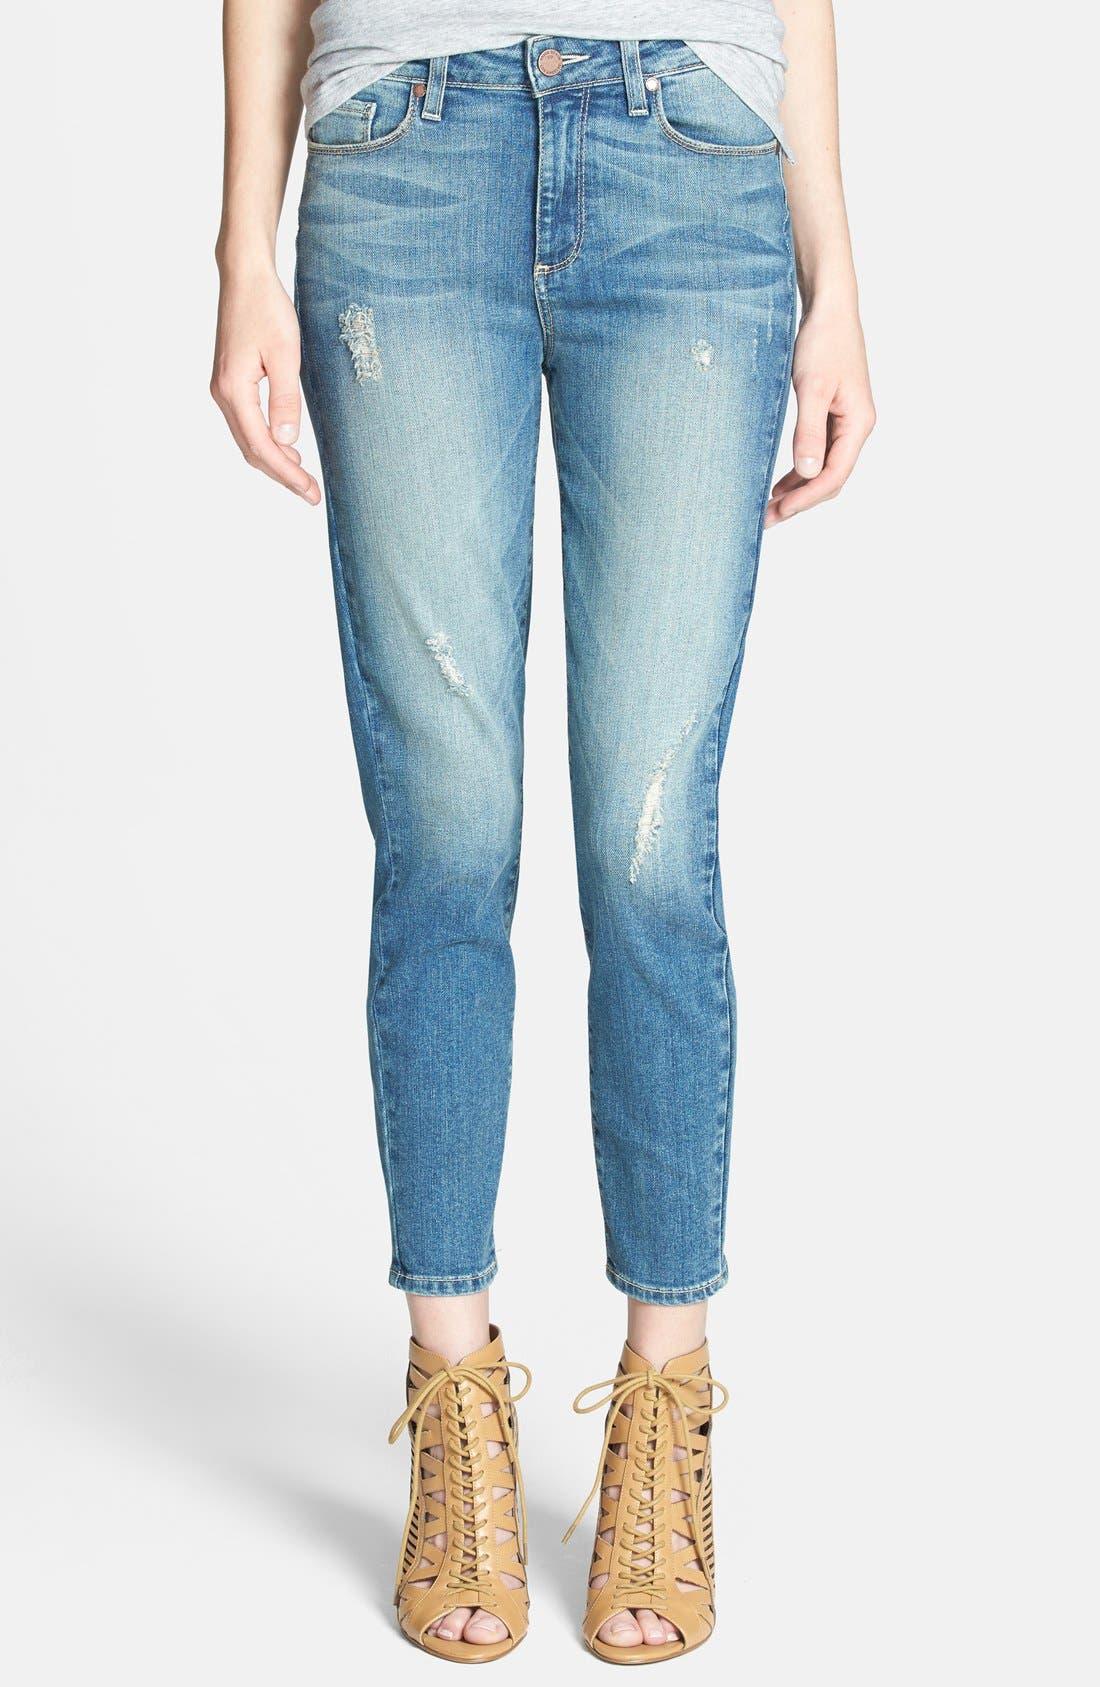 Main Image - Paige Denim 'Hoxton' Distressed High Rise Crop Jeans